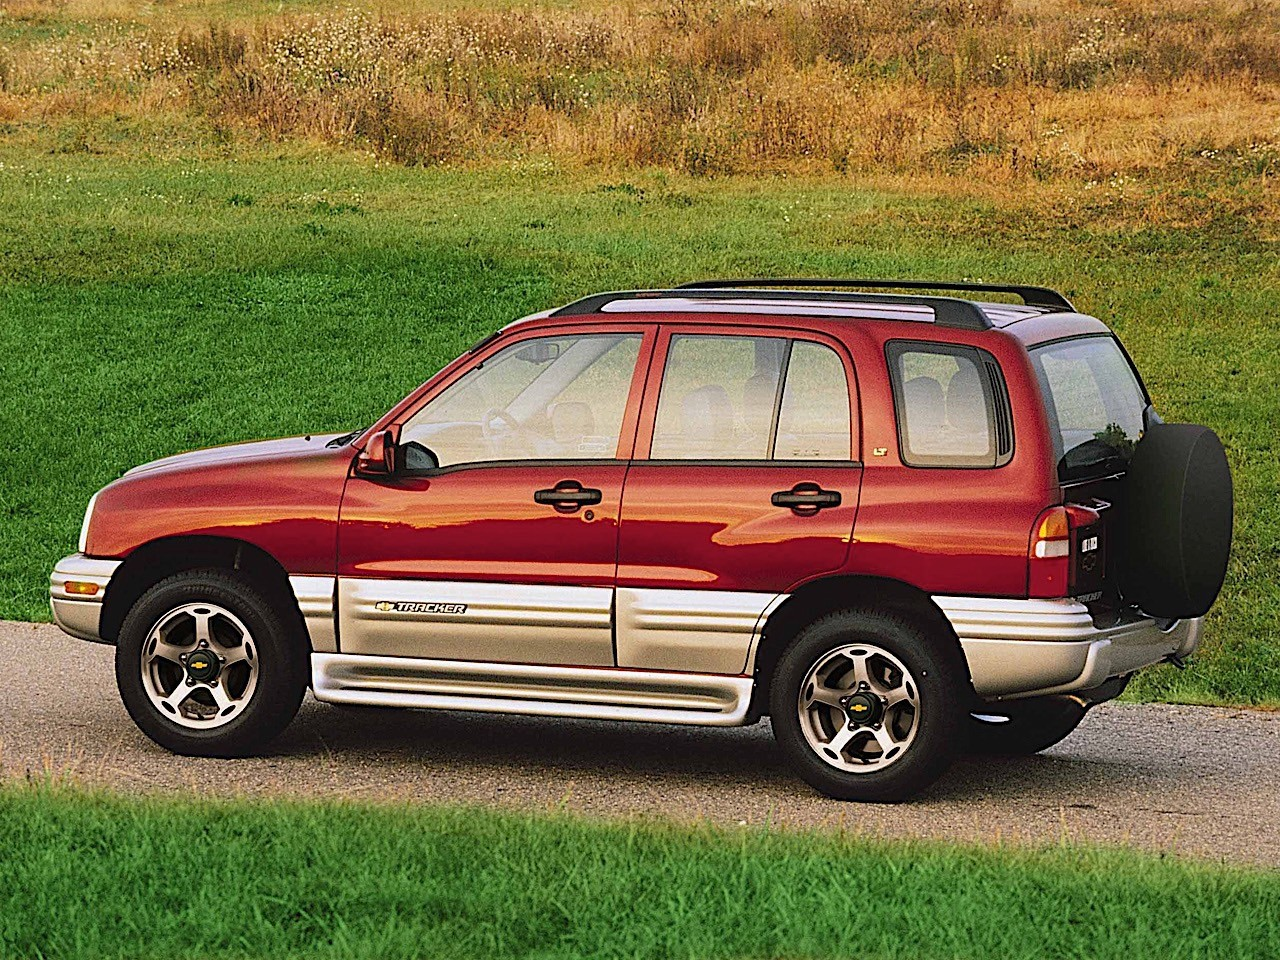 Chevrolet Tracker 1999 also Wand likewise Porsche 911 Carrera 996 2001 also Fiat 850 Sport Spider 1968 additionally Powder Coated Method Rims 533583. on gmc 6 0 motor